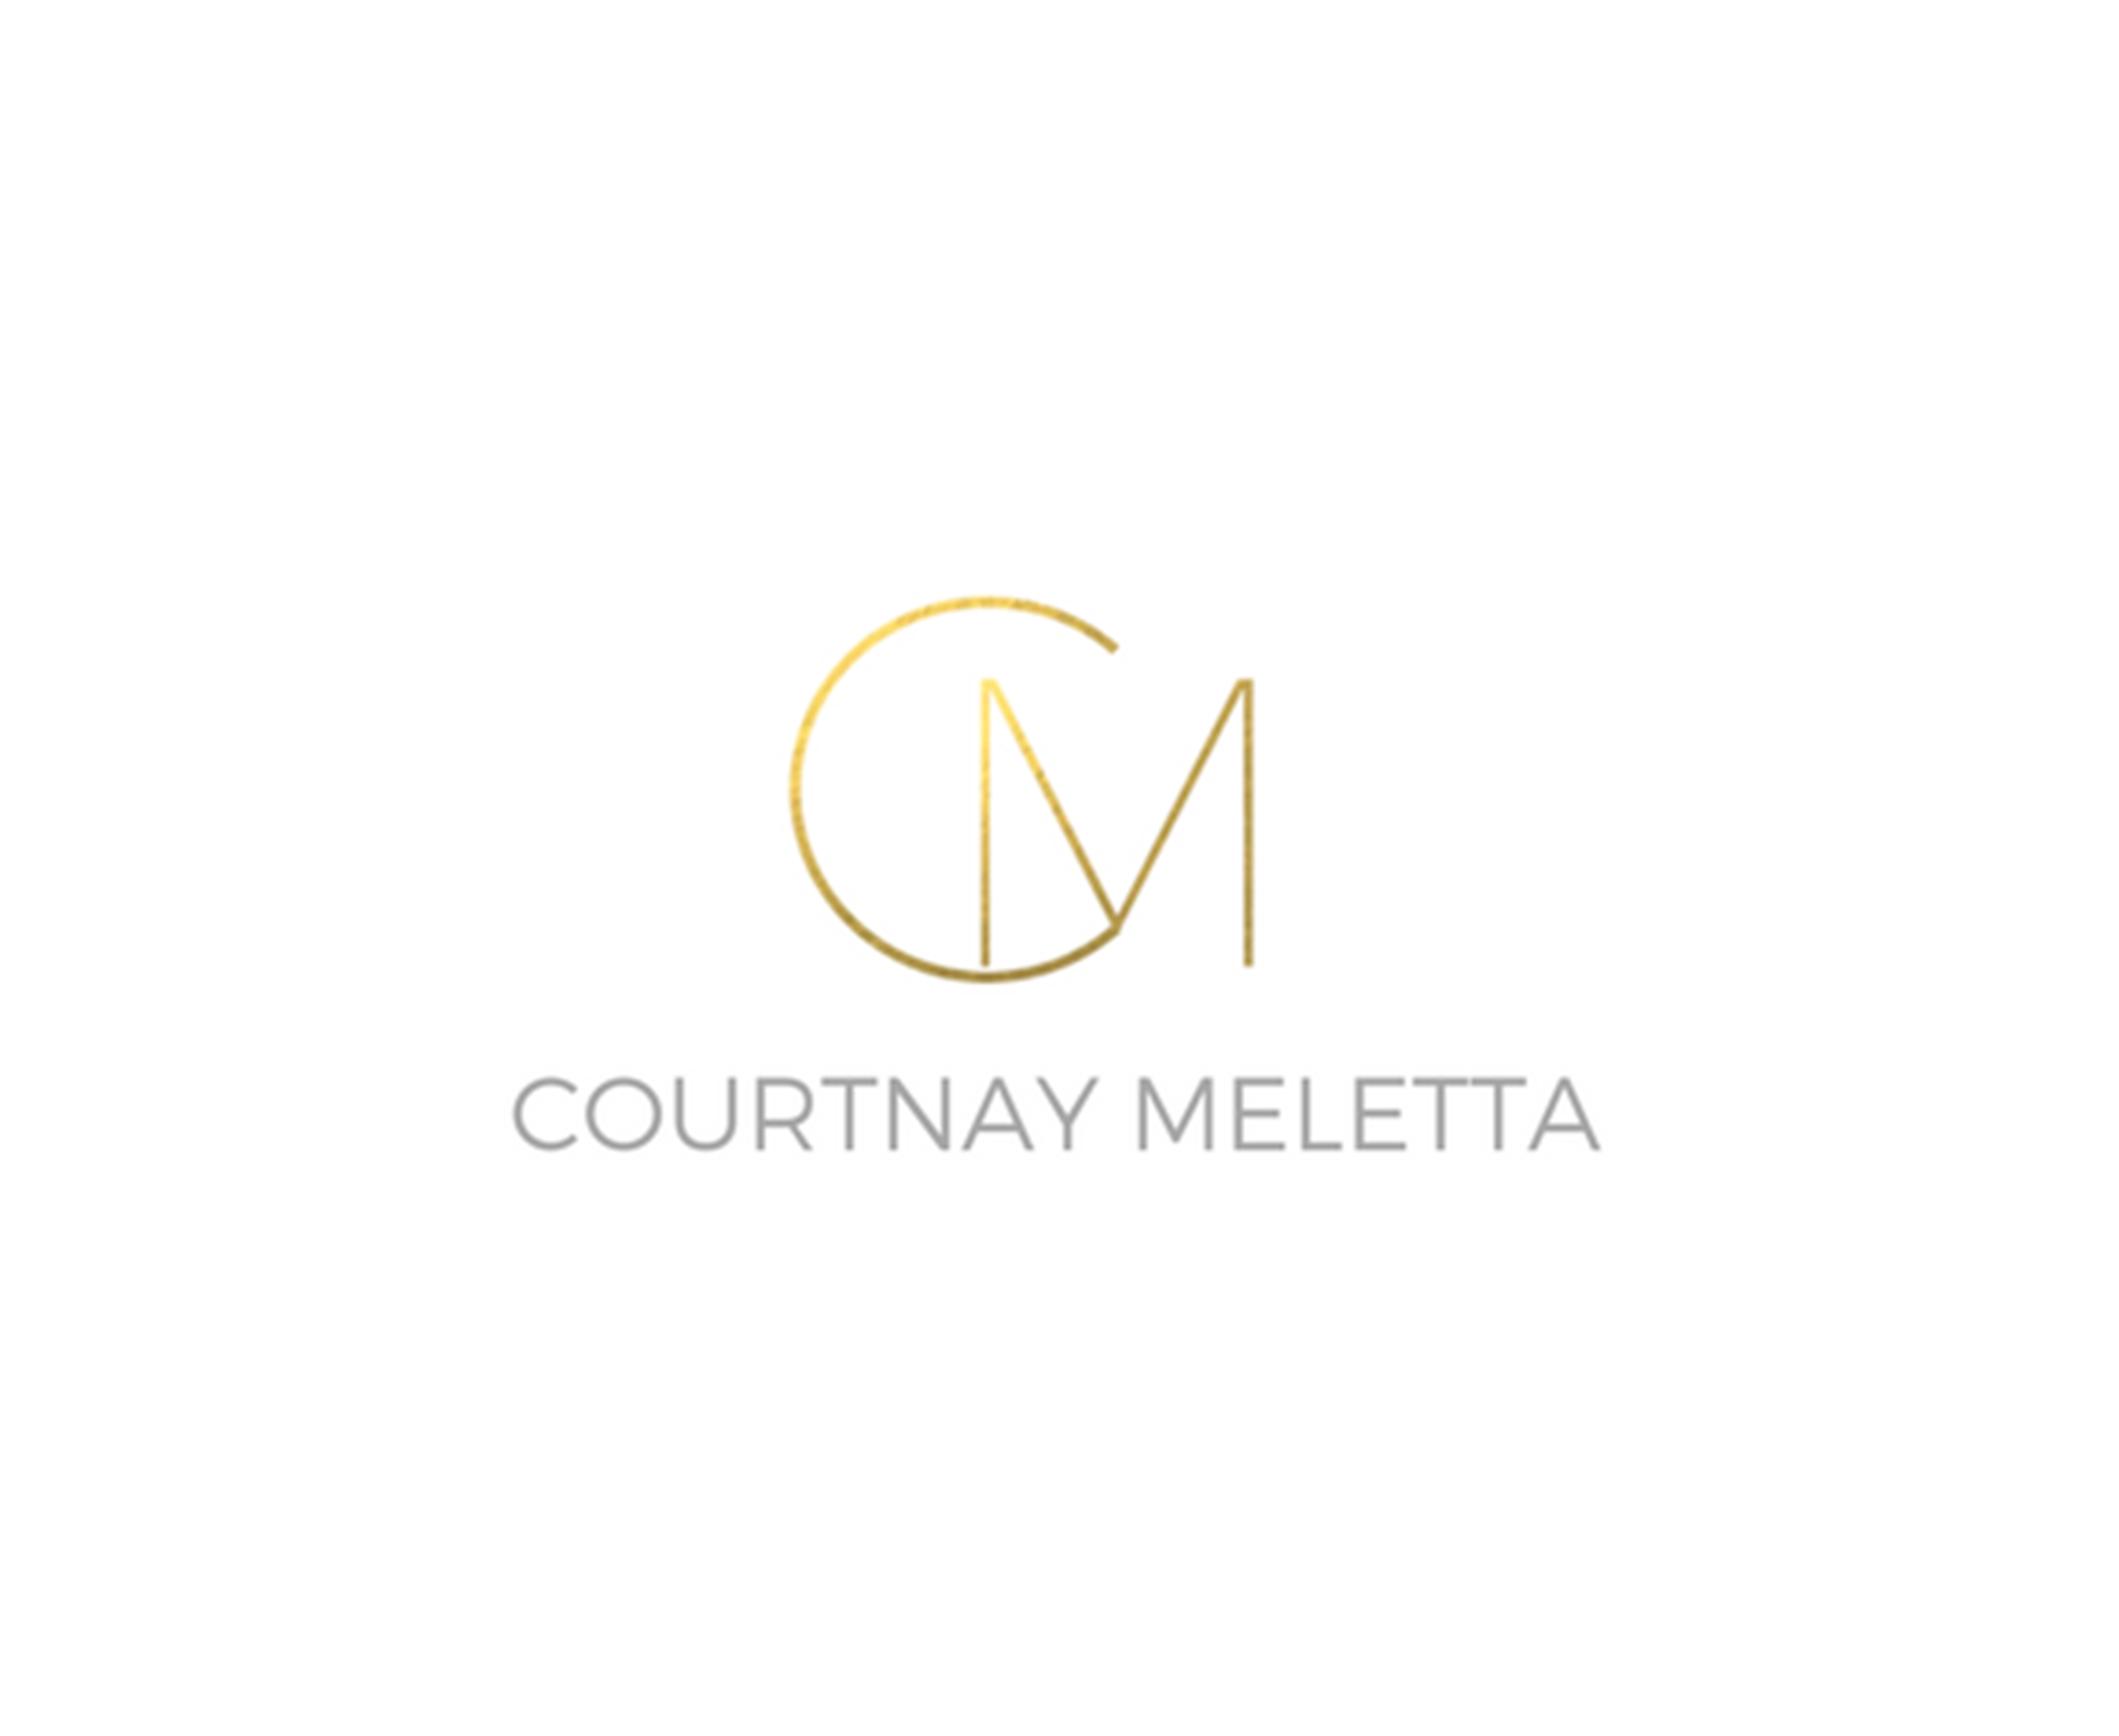 Logo design for Courtnay